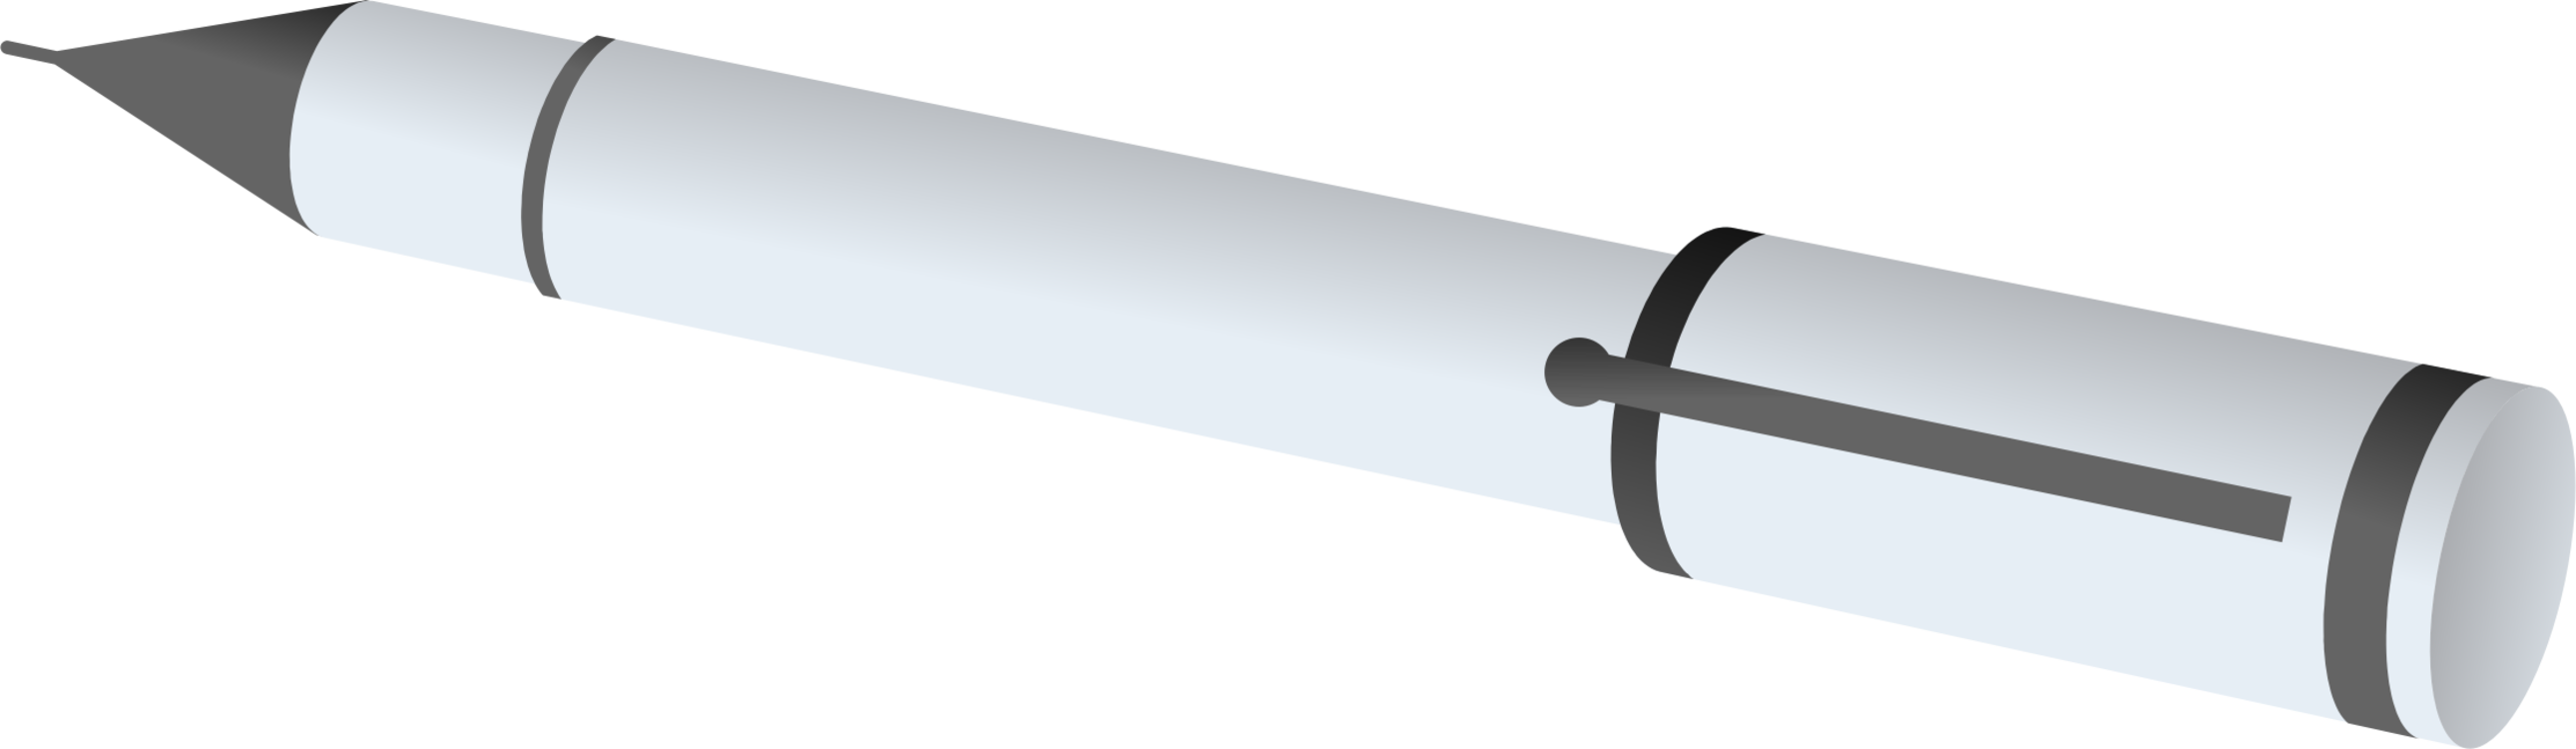 Angle,Cylinder,Hardware Accessory